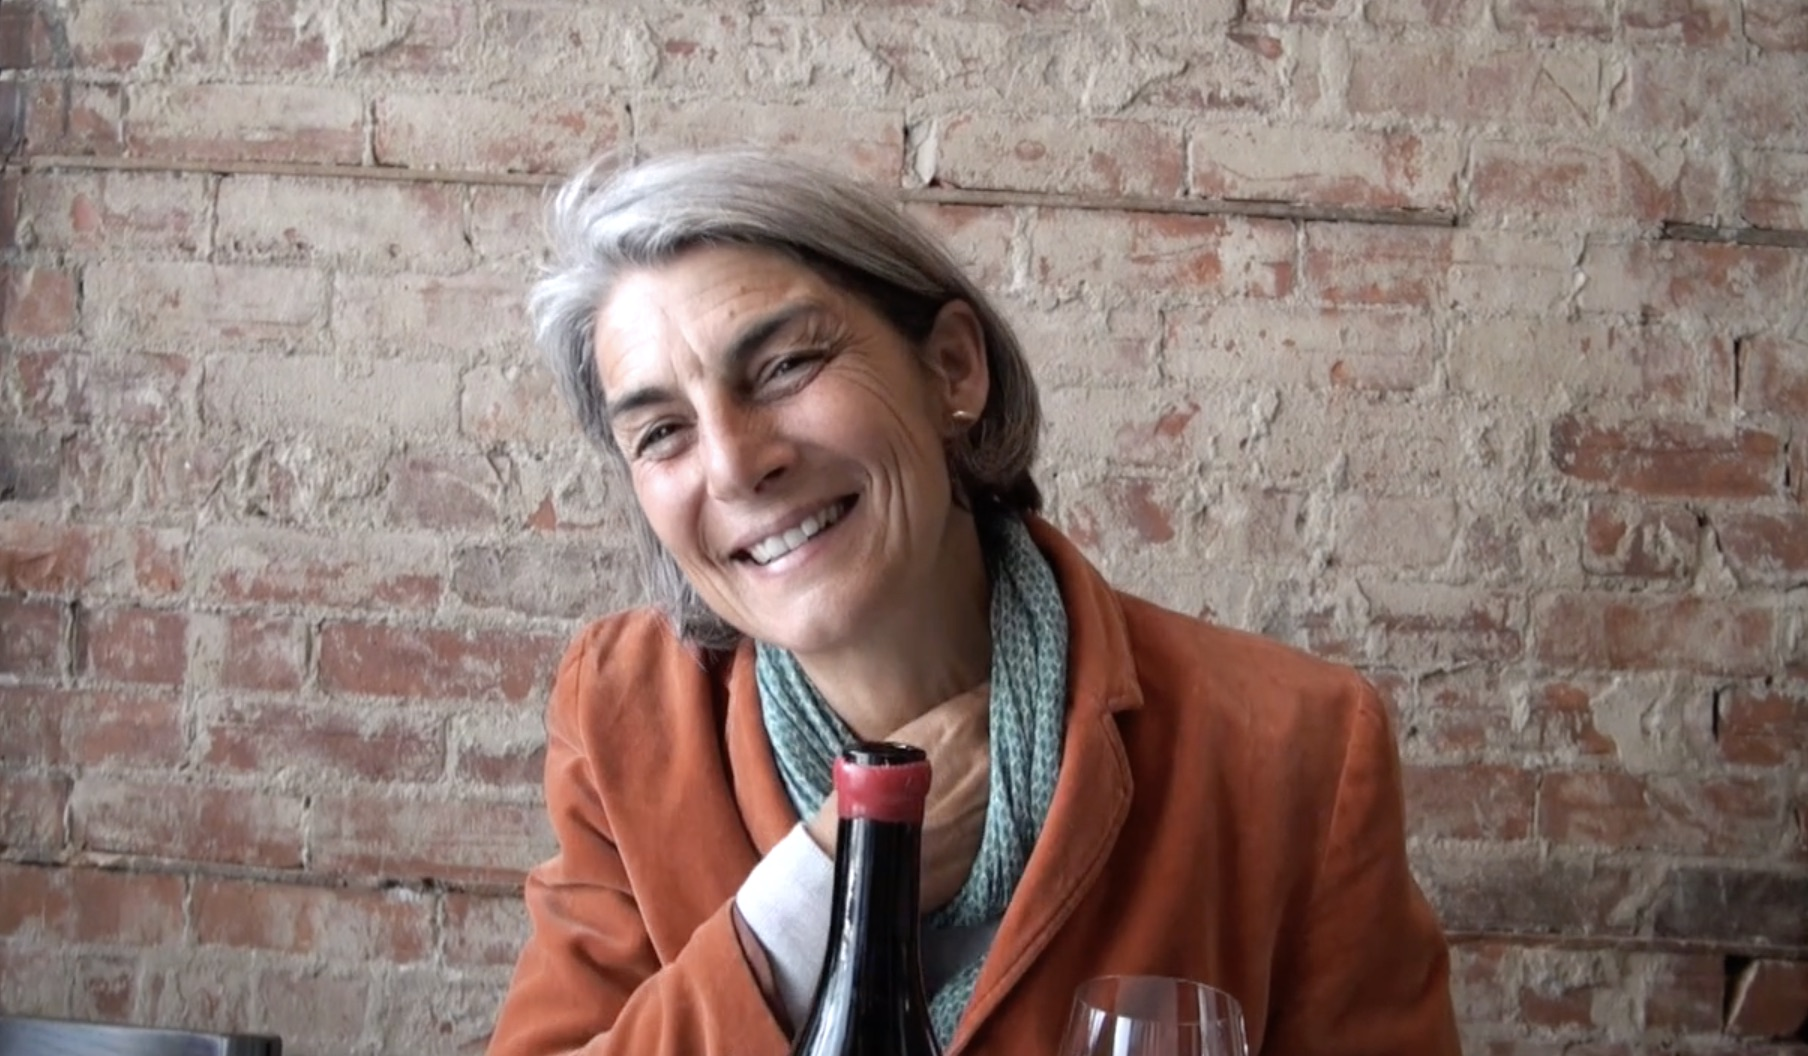 The simply lovely Elisabetta Foradori captured here at Toronto's Dandylion restaurant.